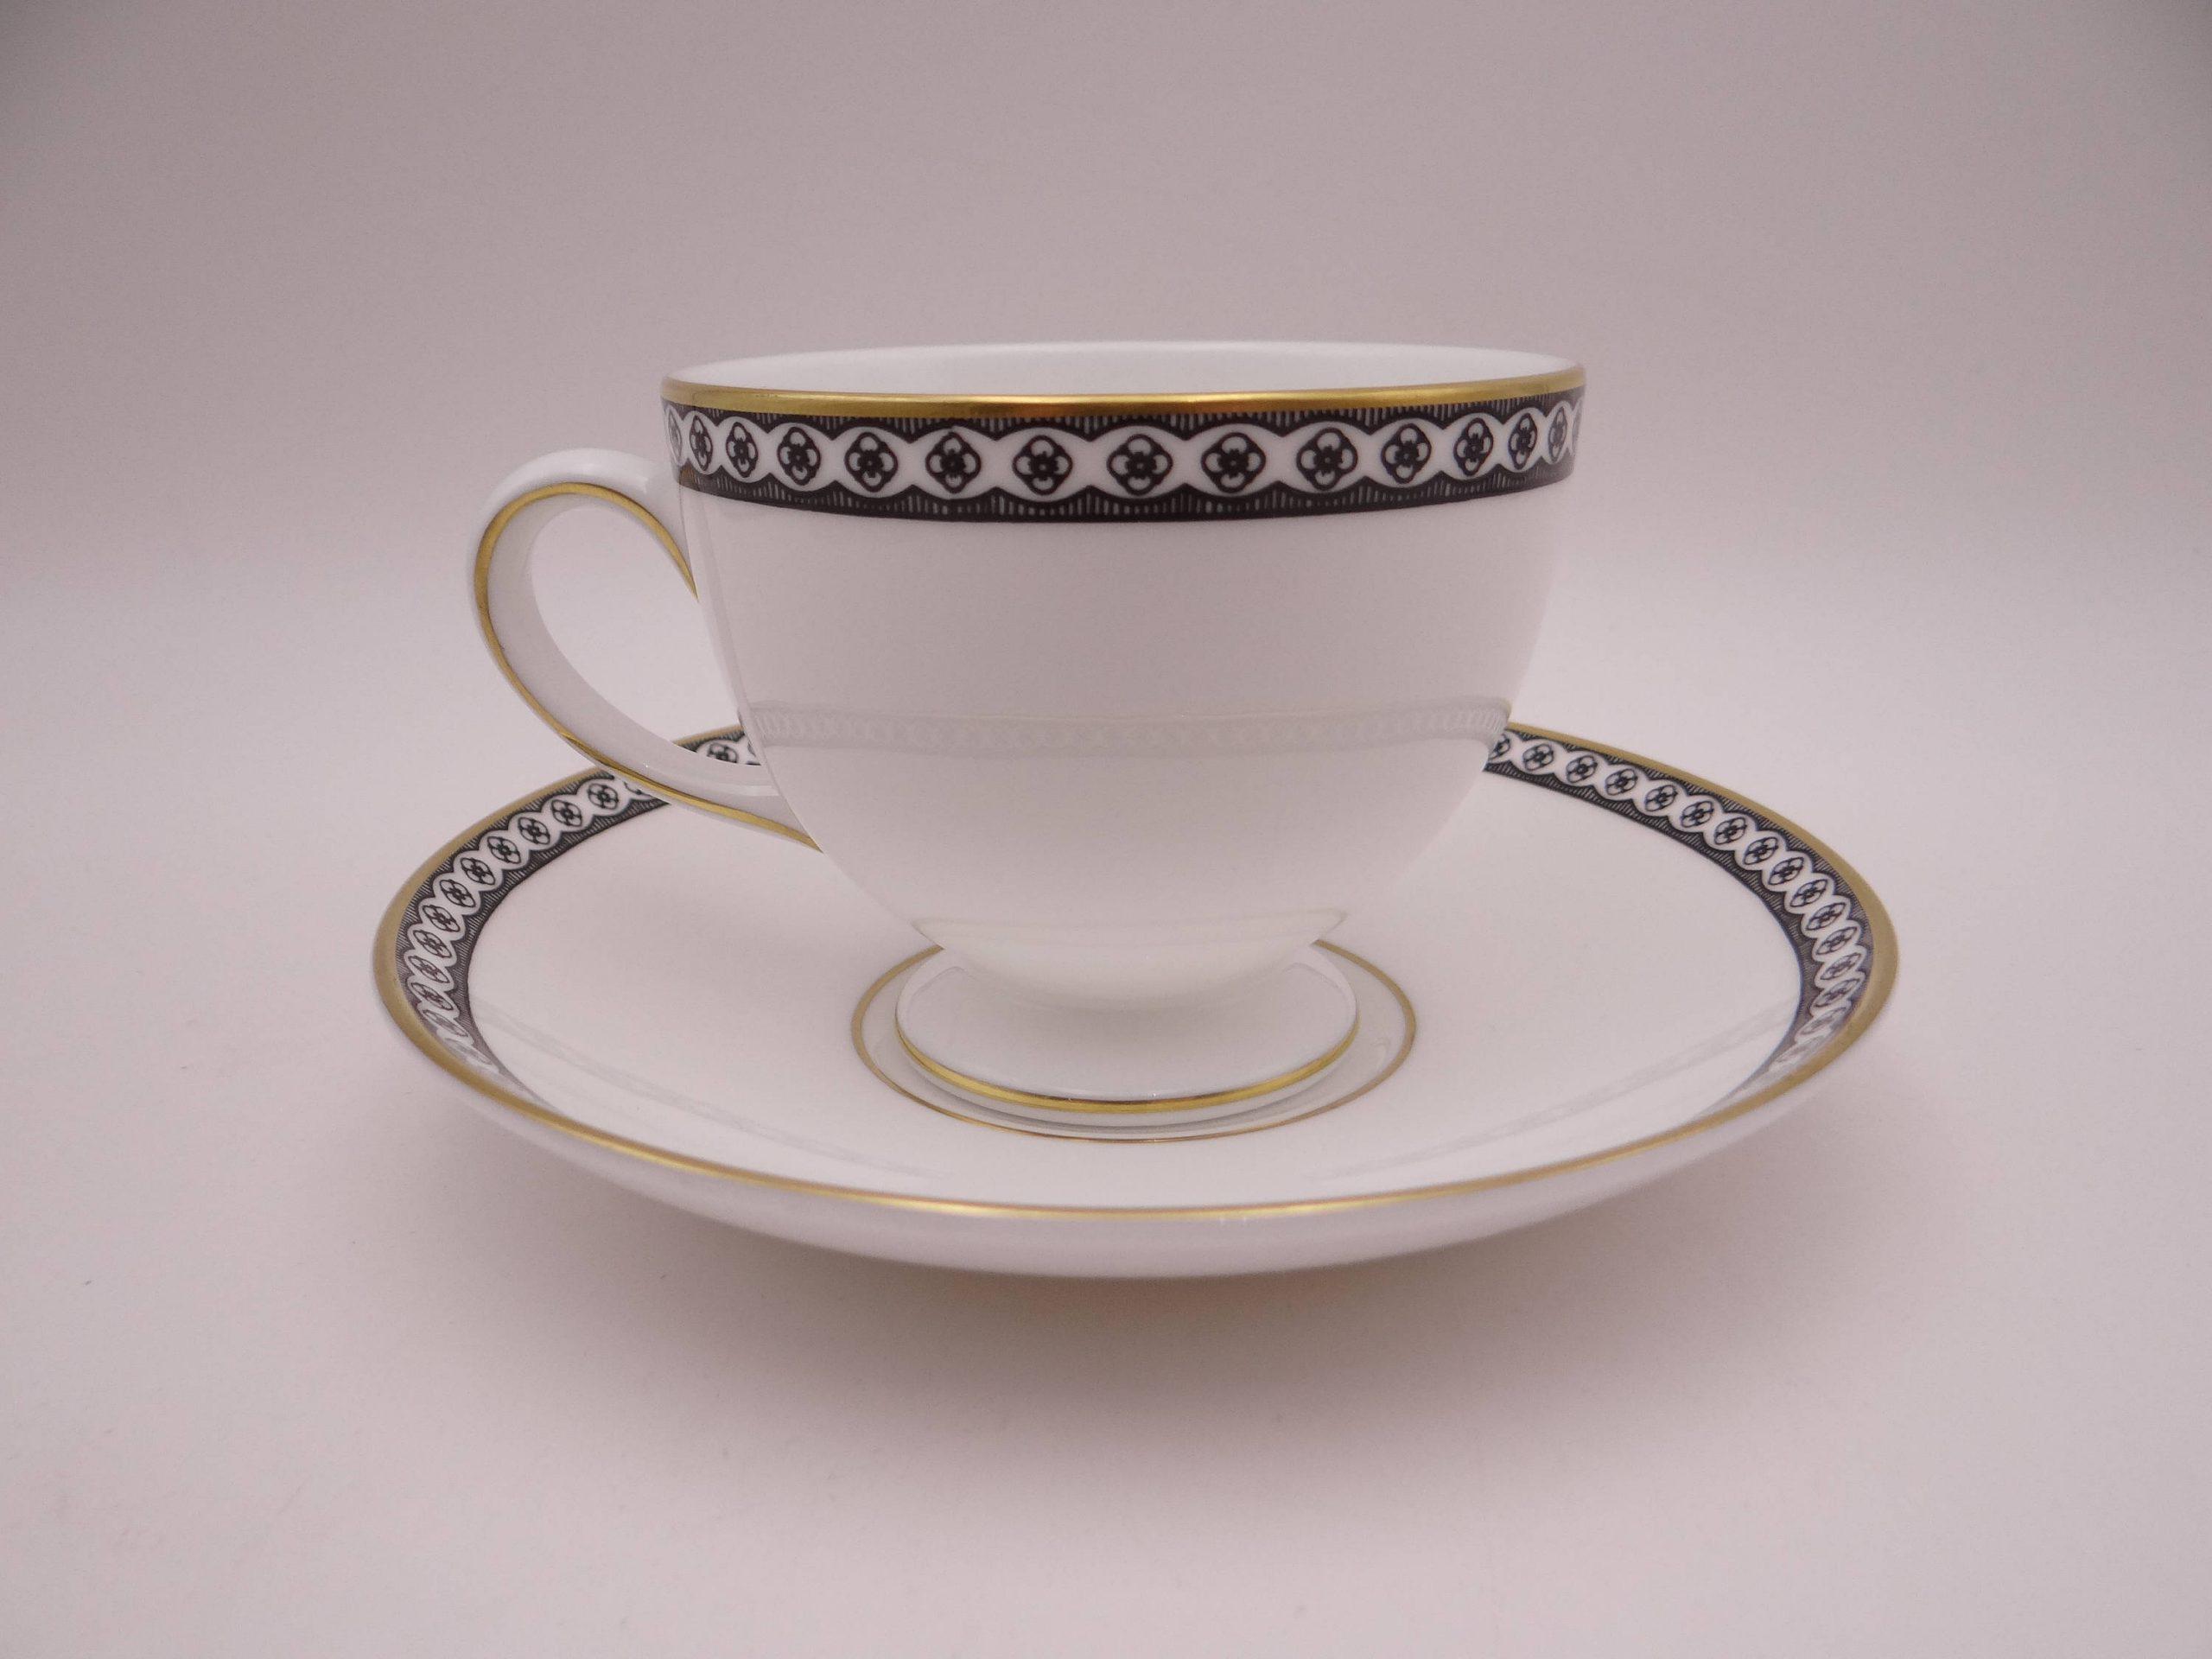 78535G Tea Saucer Wedgwood Ulander Black